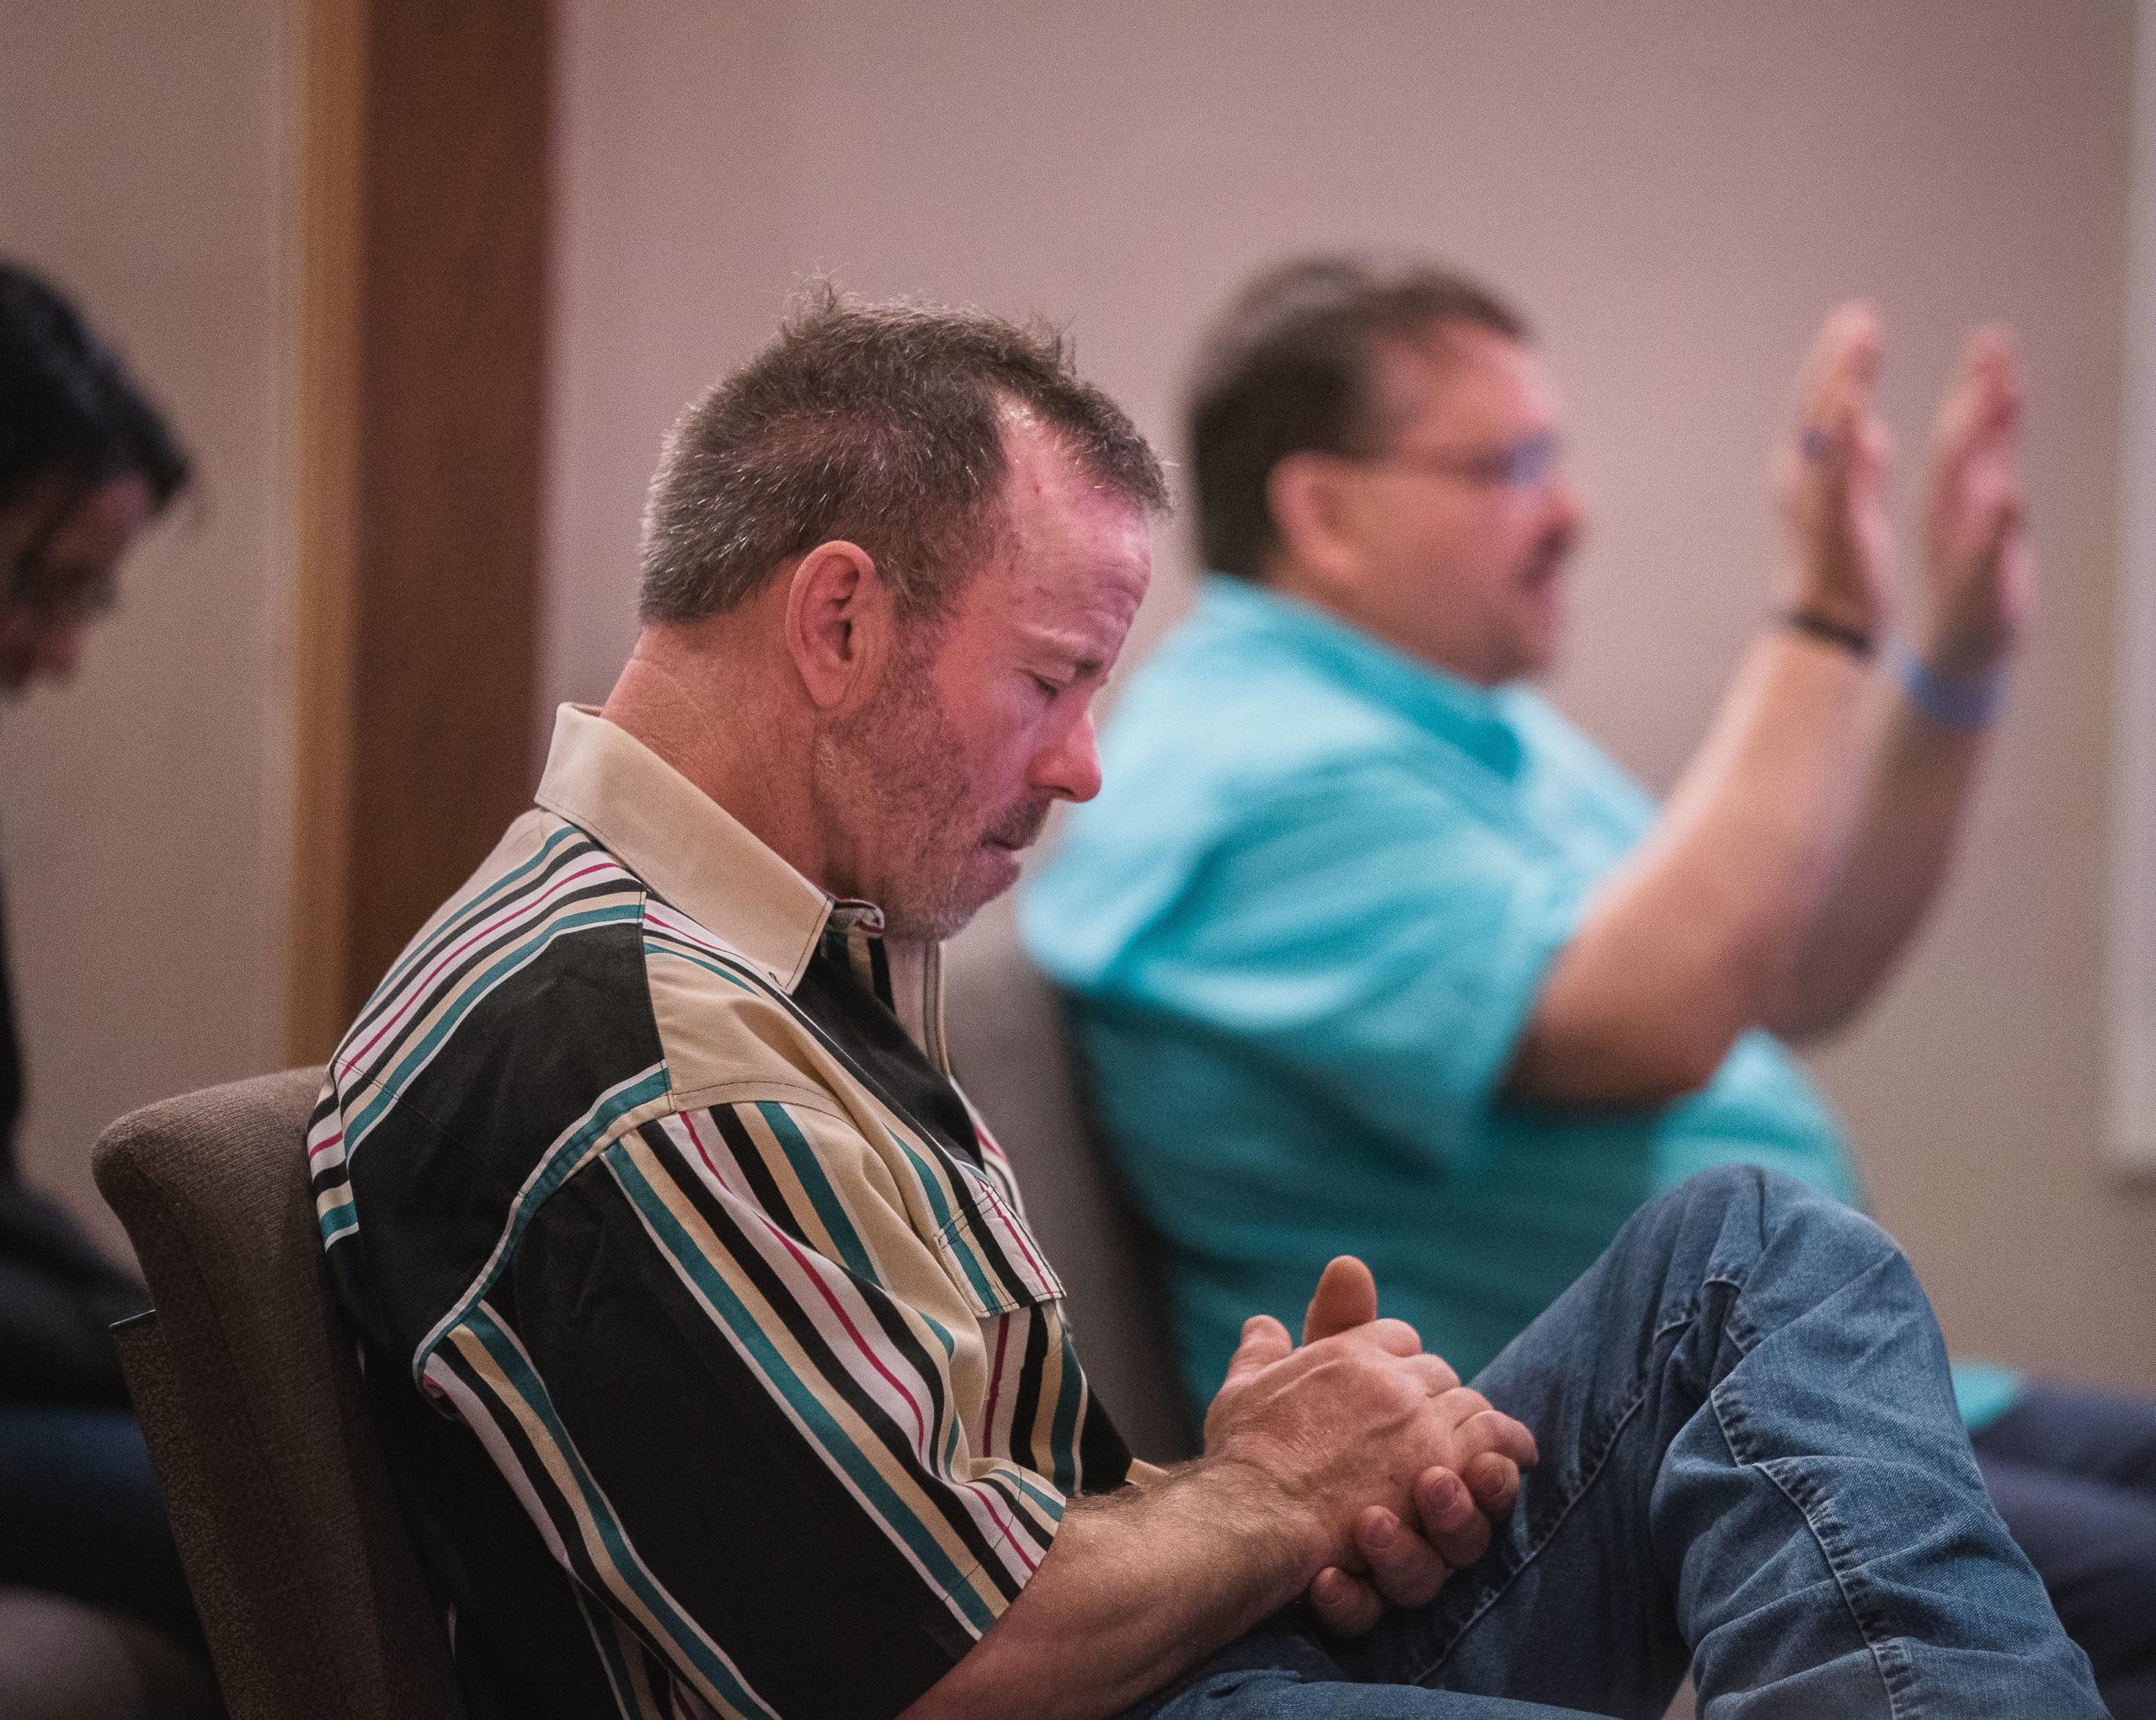 Mens group, Kingdom Builders at Faith Family Billings Church, Billings, MT